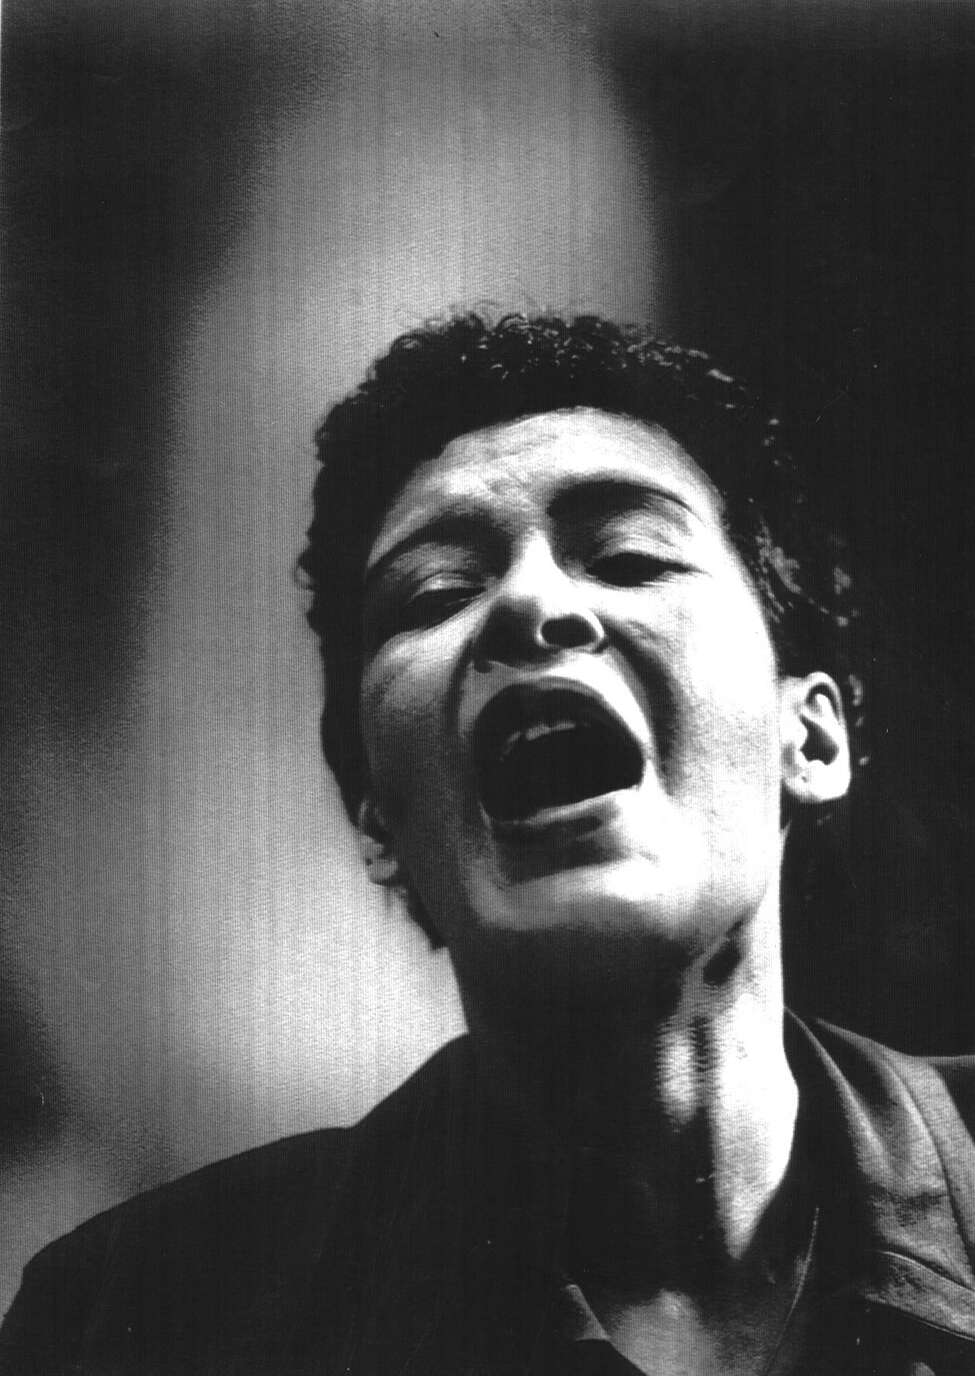 SAN FRANCISICO--Billie Holiday, jazz singer.